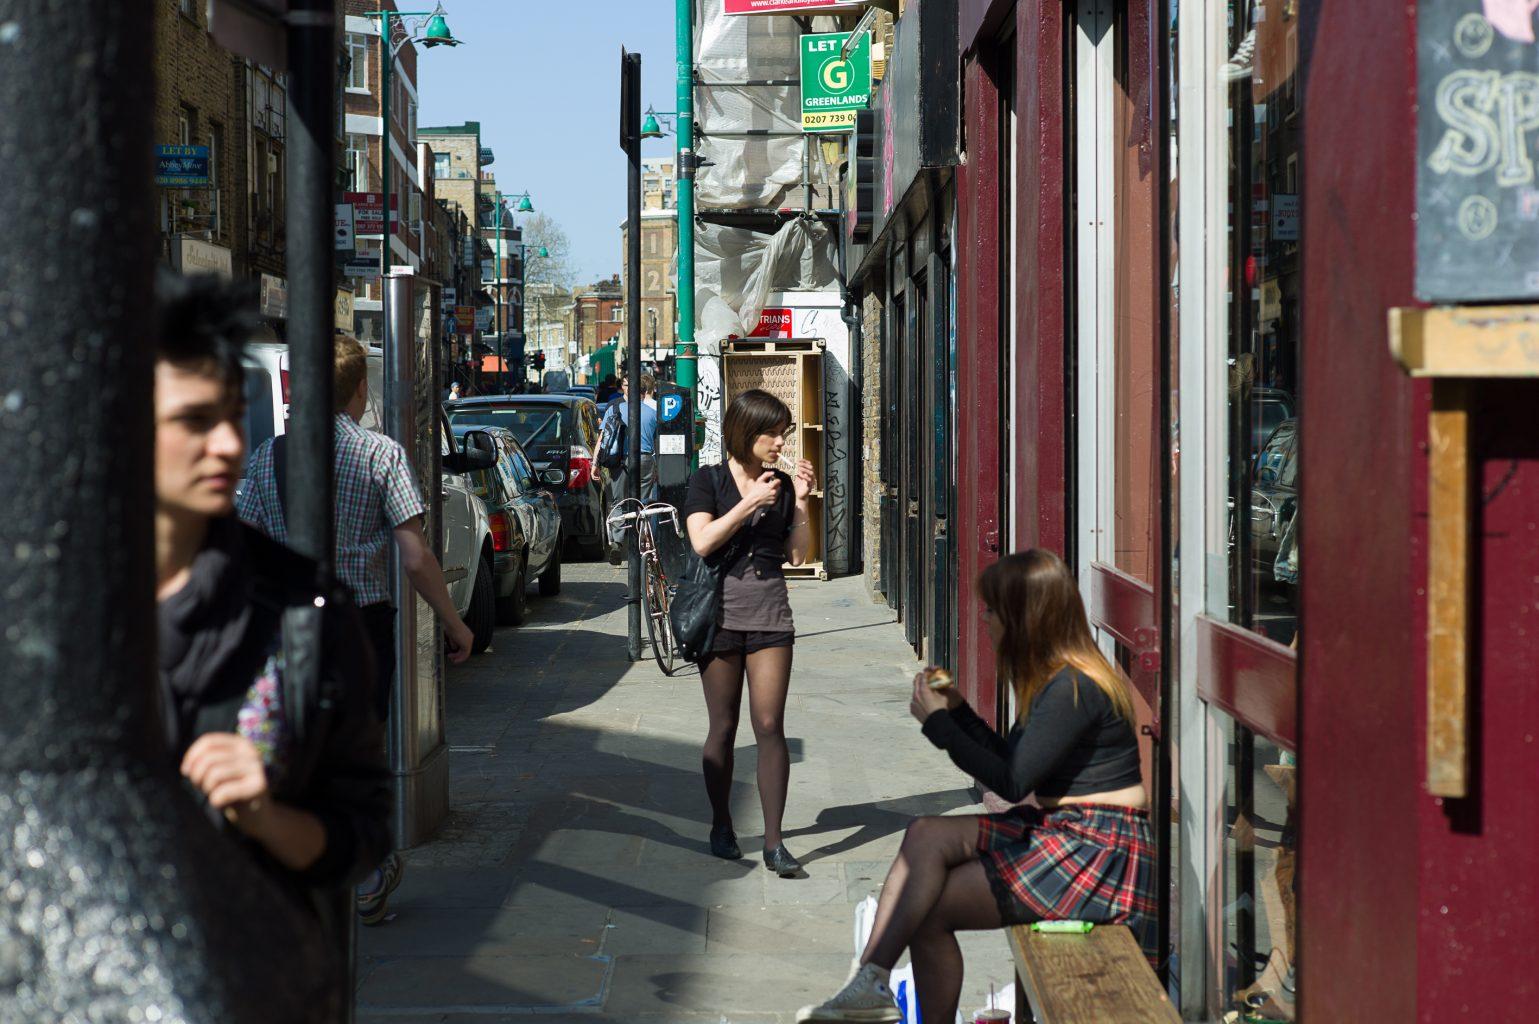 City Colour II, Brick Lane, London, 9. April 2011